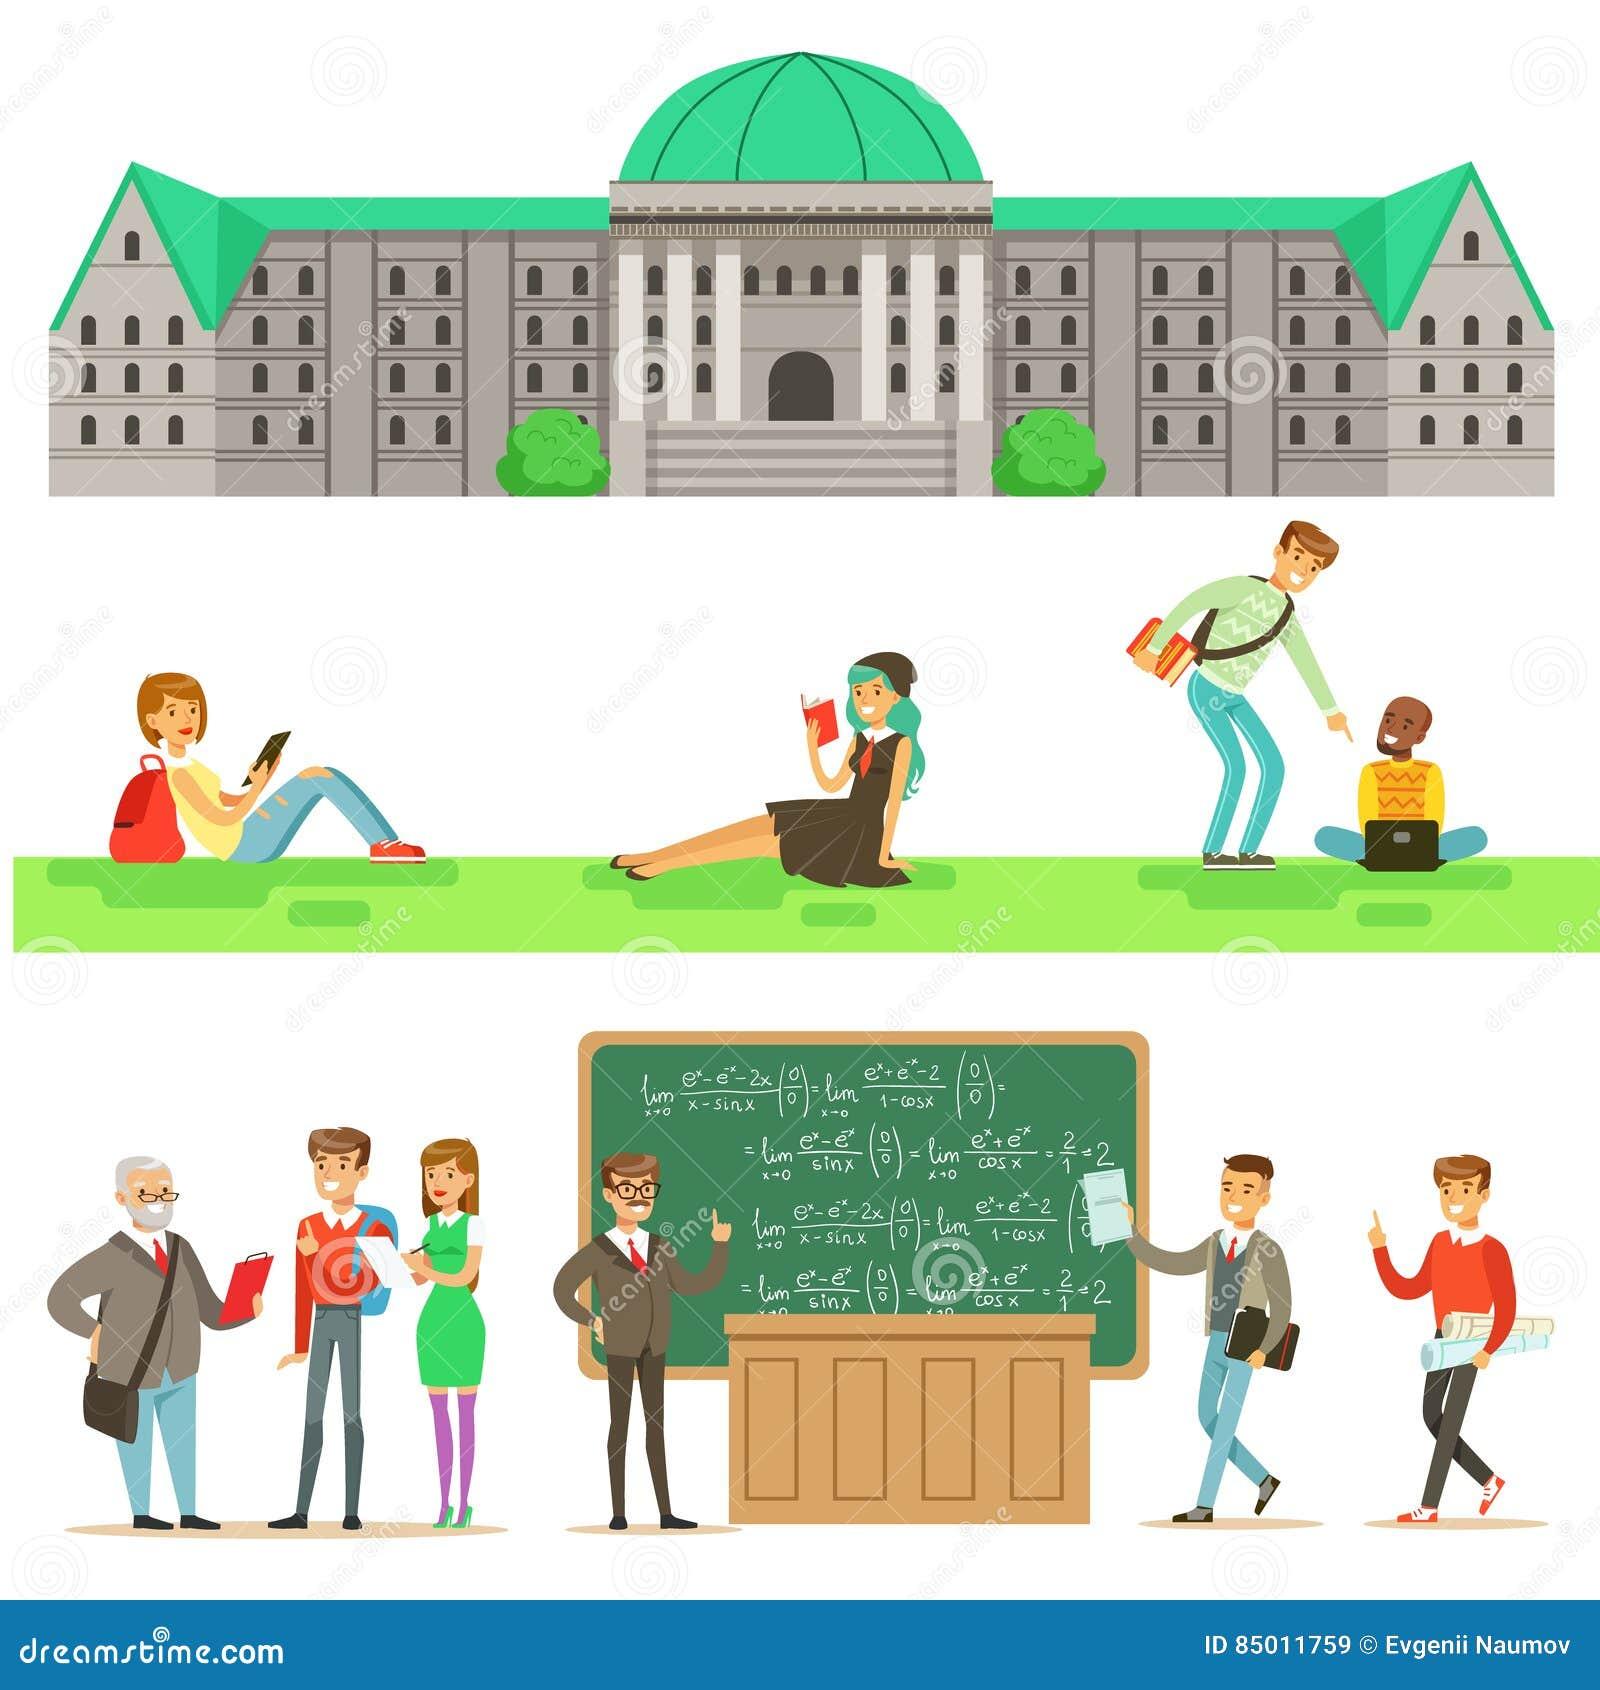 University professors dating students